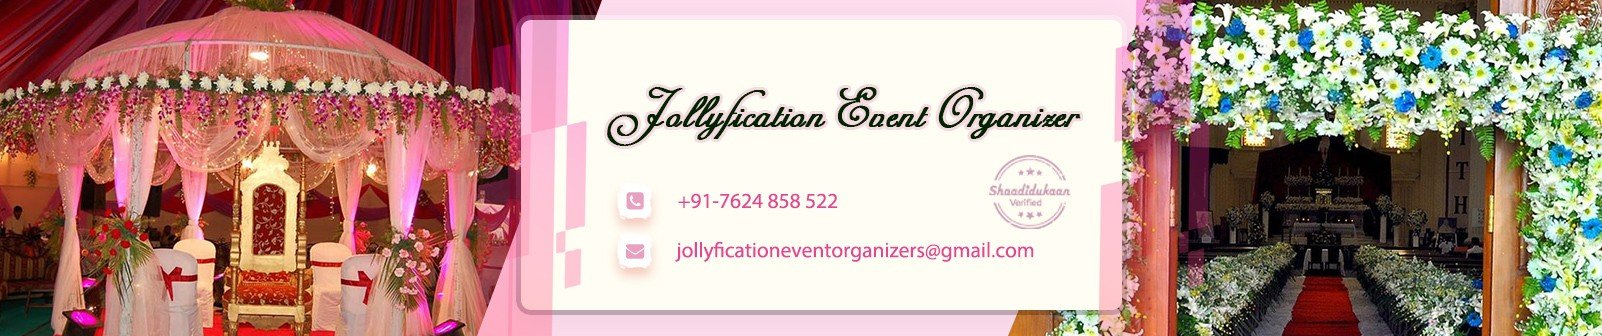 Jollyfication Event Organizer